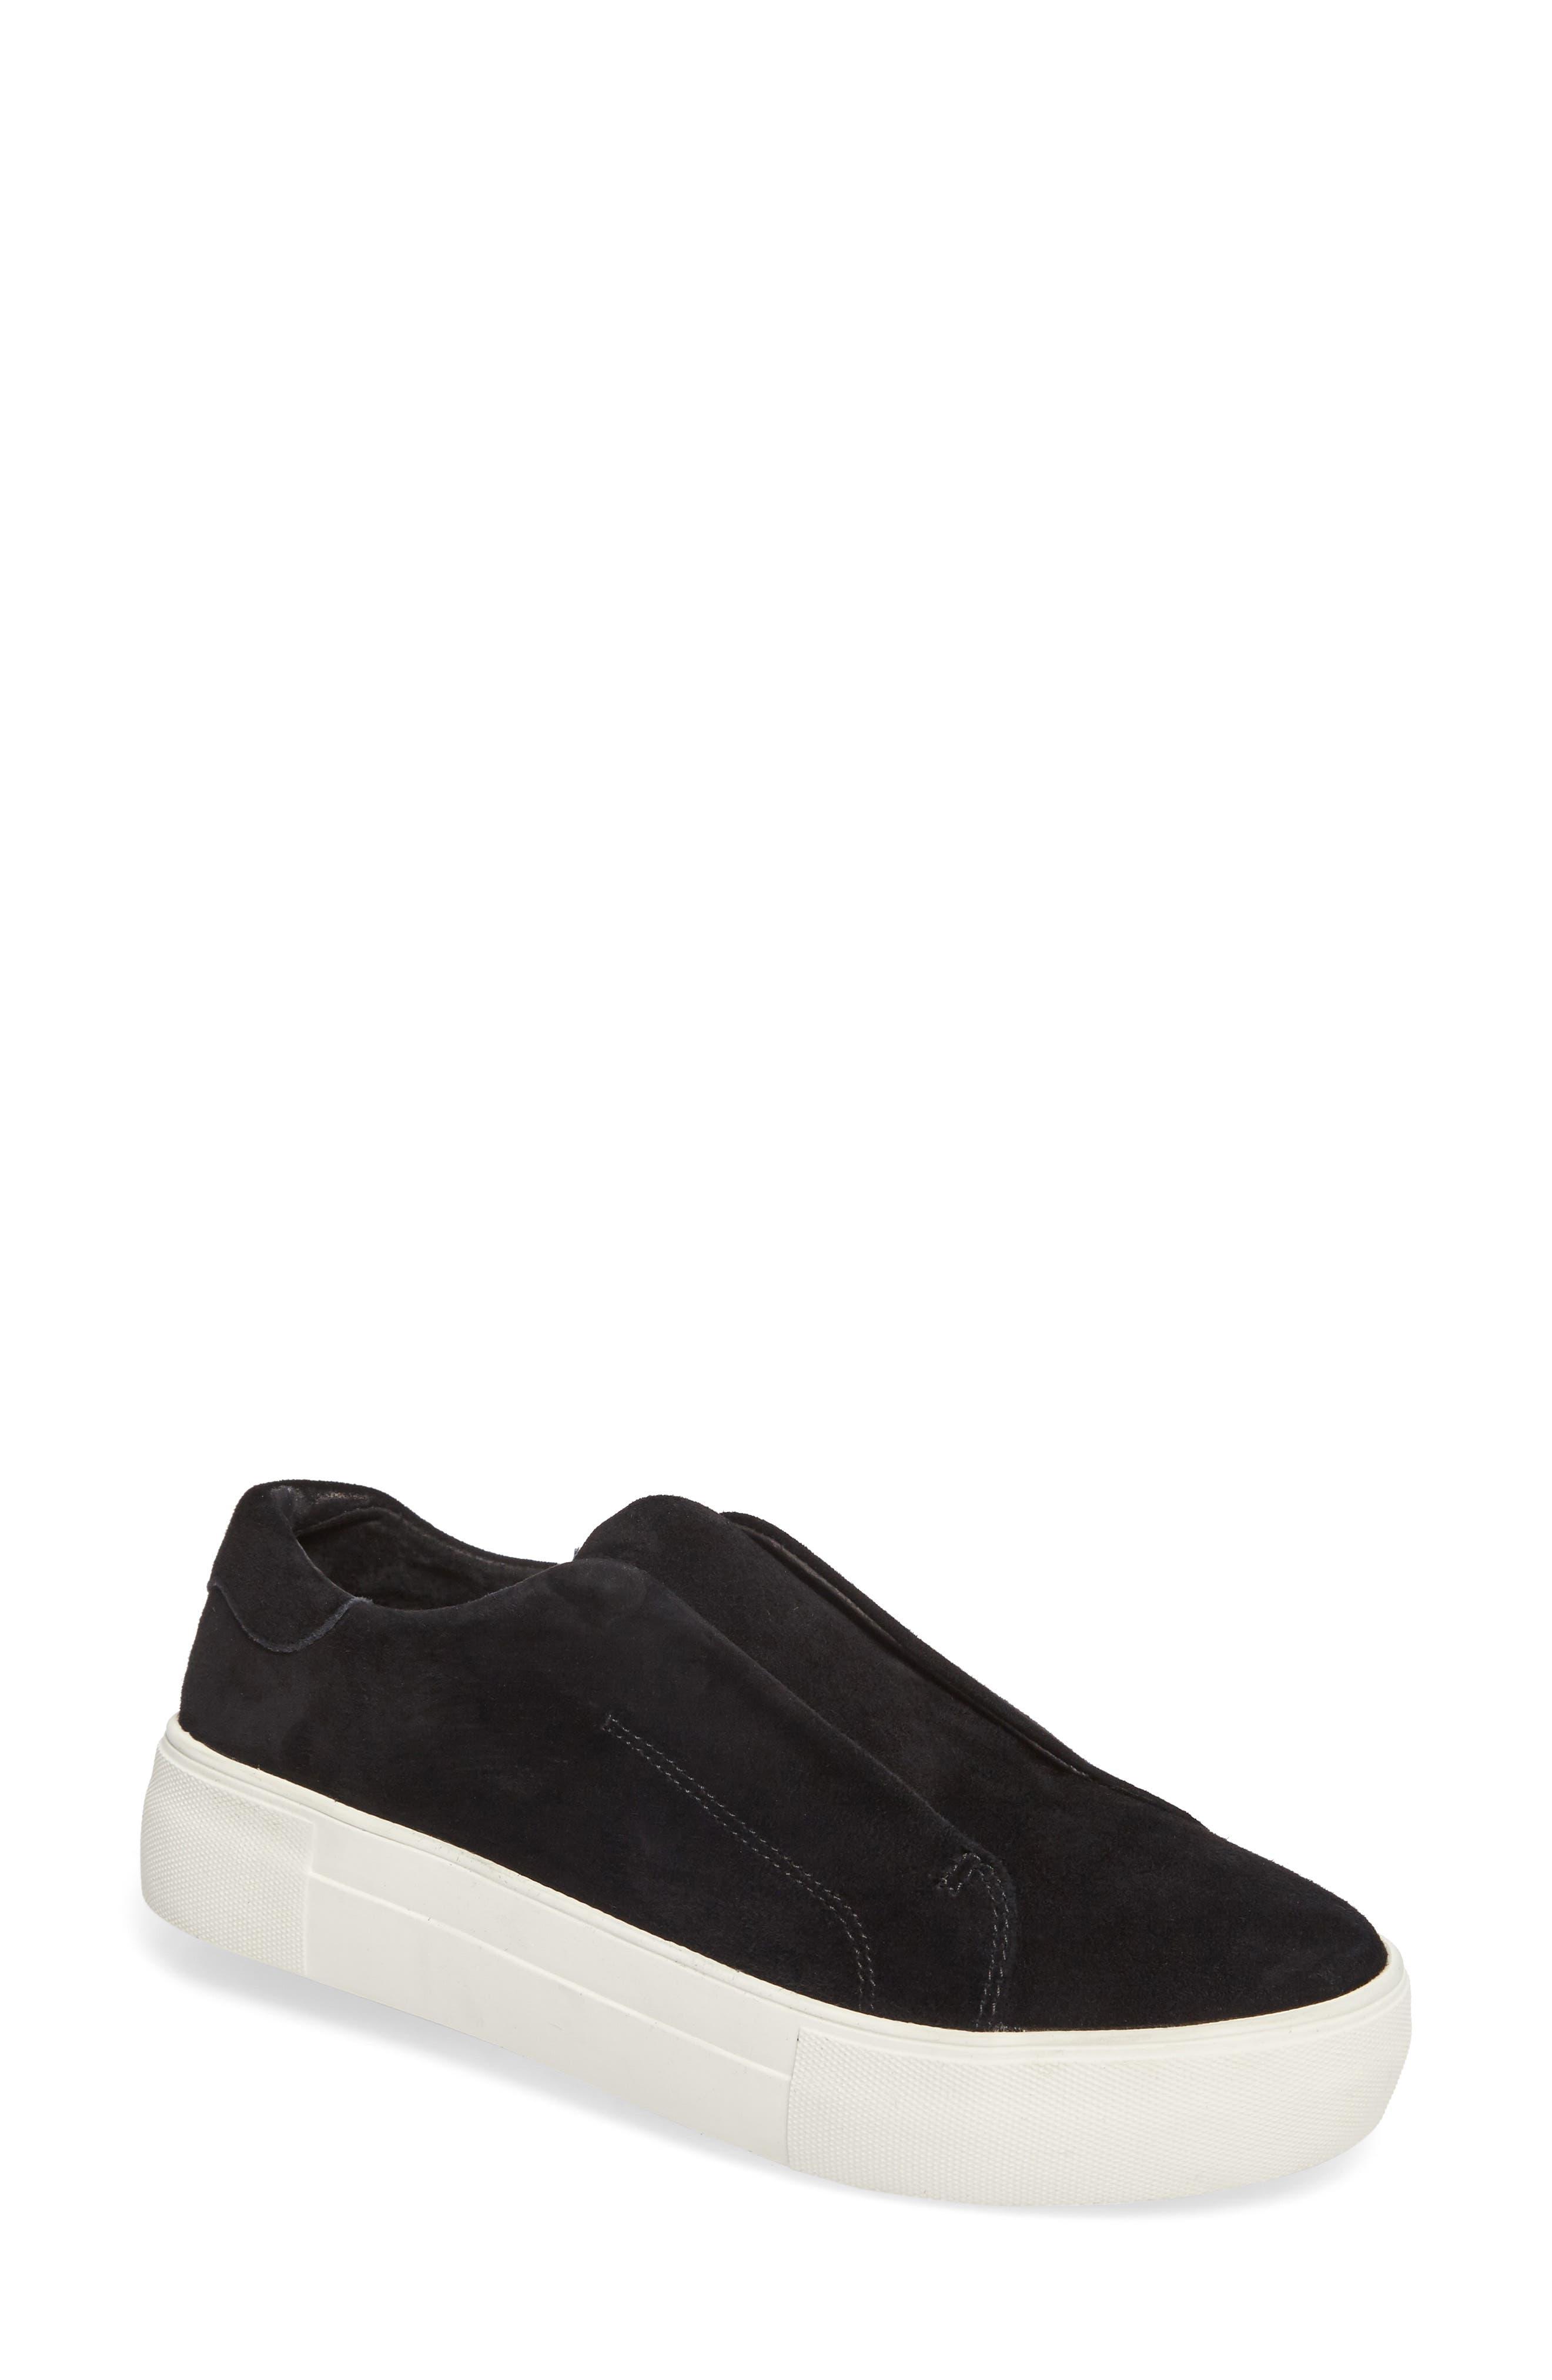 JSLIDES,                             Alara Slip-On Sneaker,                             Main thumbnail 1, color,                             002